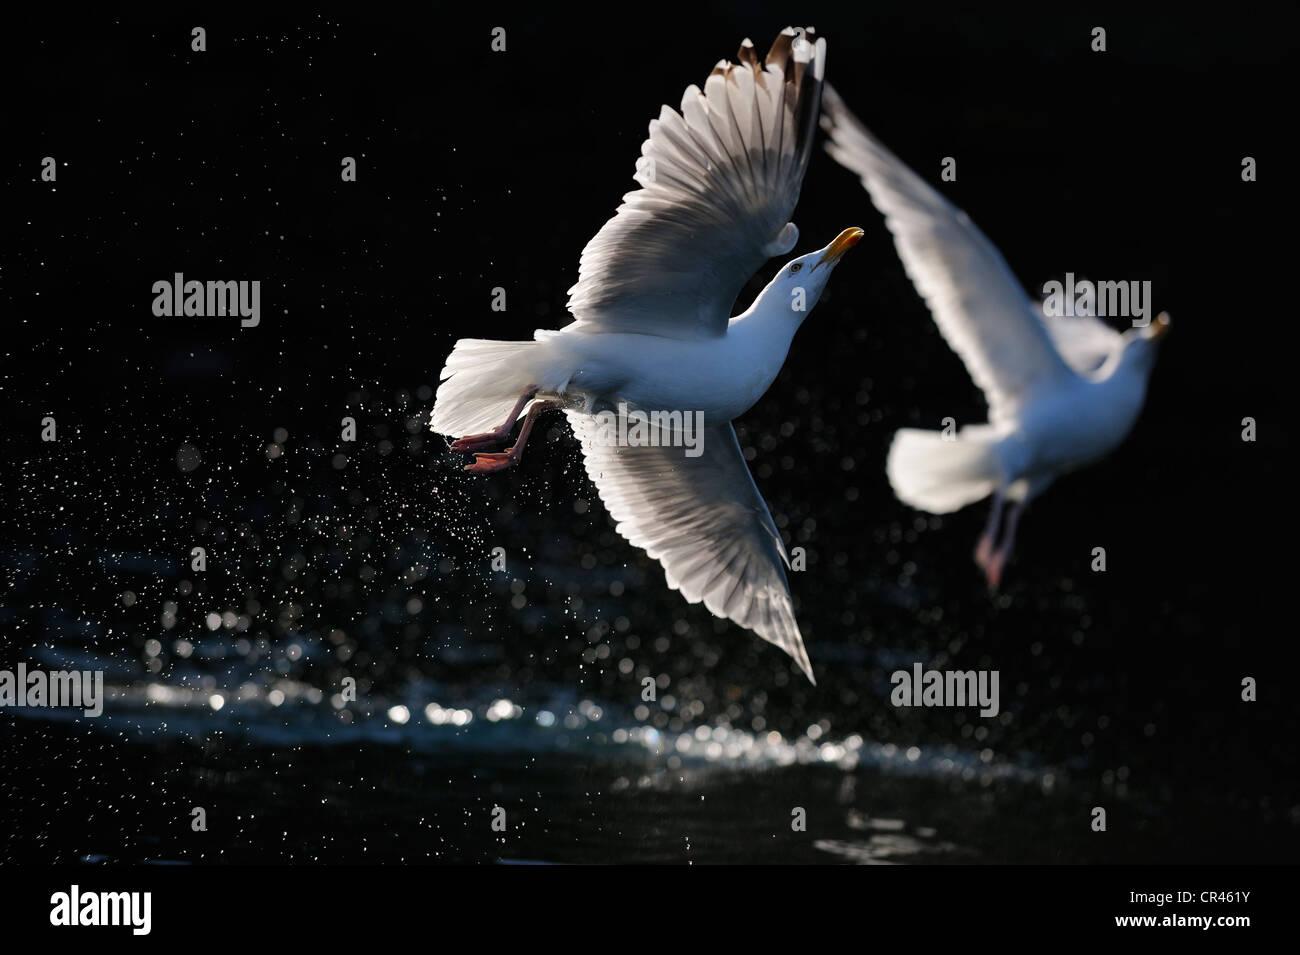 European Herring Gulls (Larus argentatus) flying over water, backlight, Flatanger, Nordtrondelag, Norway, Scandinavia, - Stock Image